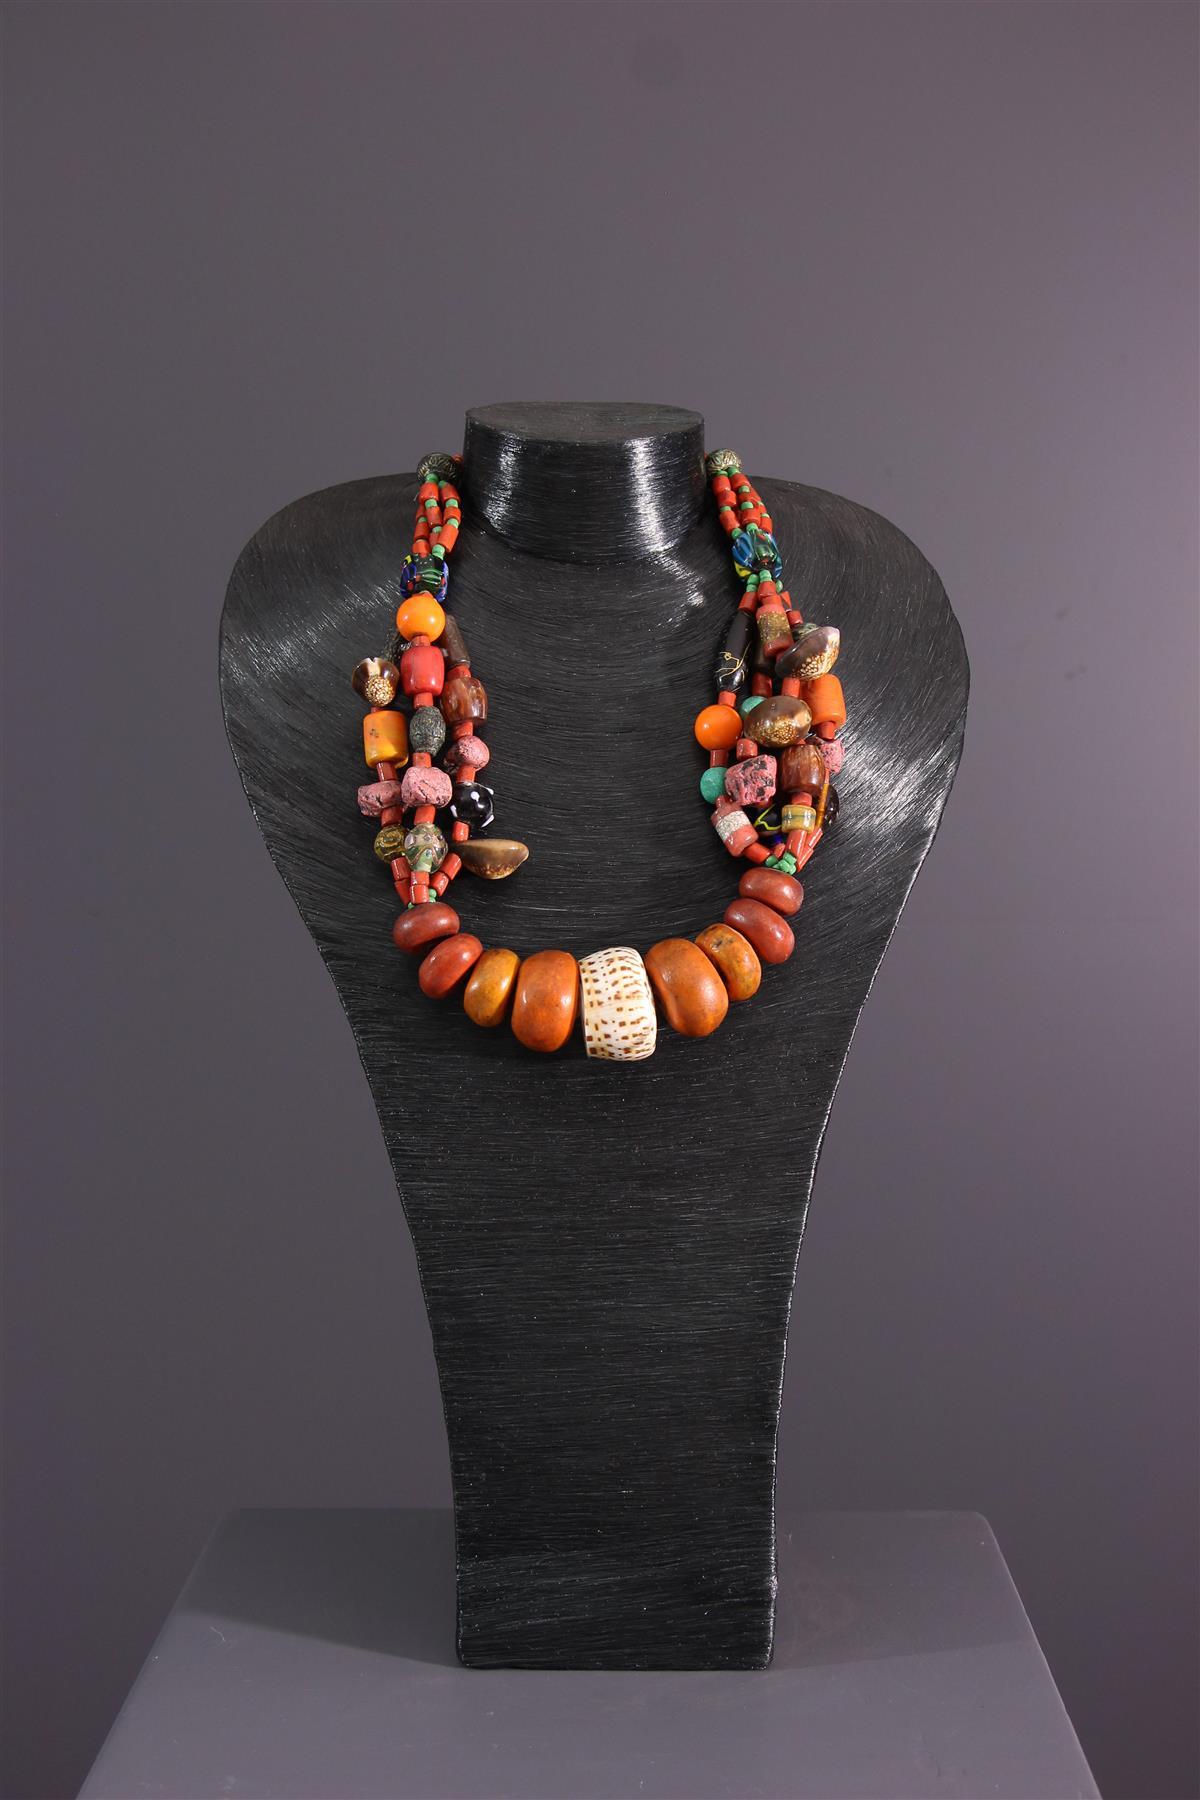 Collier Berbère - Art africain